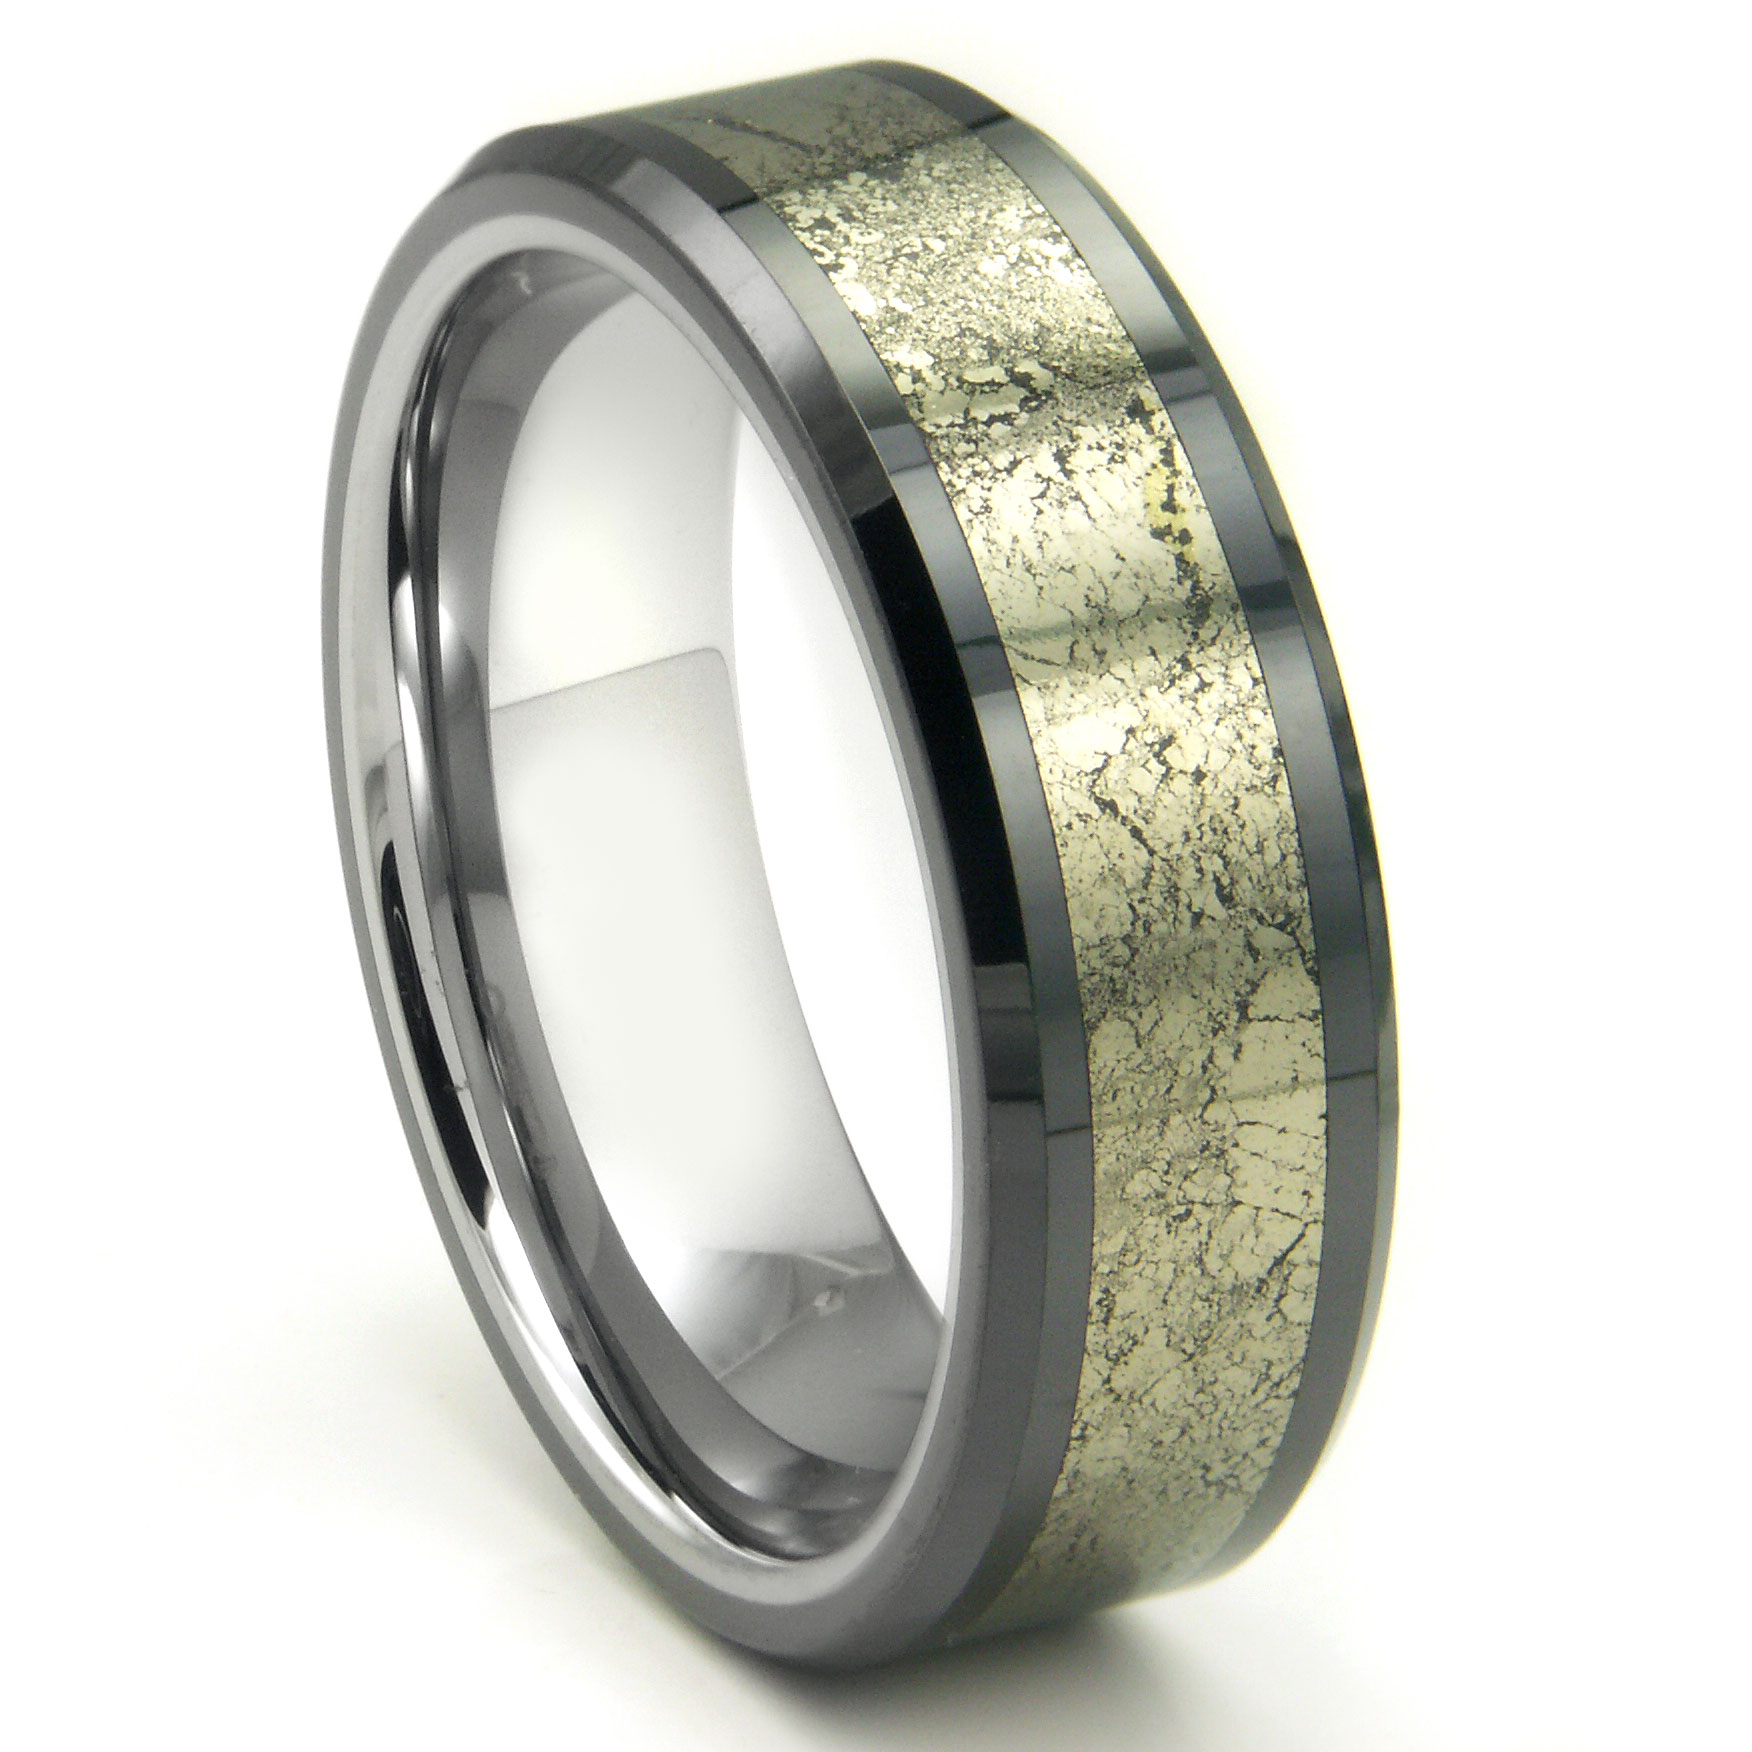 Mens Tungsten Carbide Rings mens titanium wedding rings Tungsten Carbide Golden Meteorite Inlay Wedding Band Ring